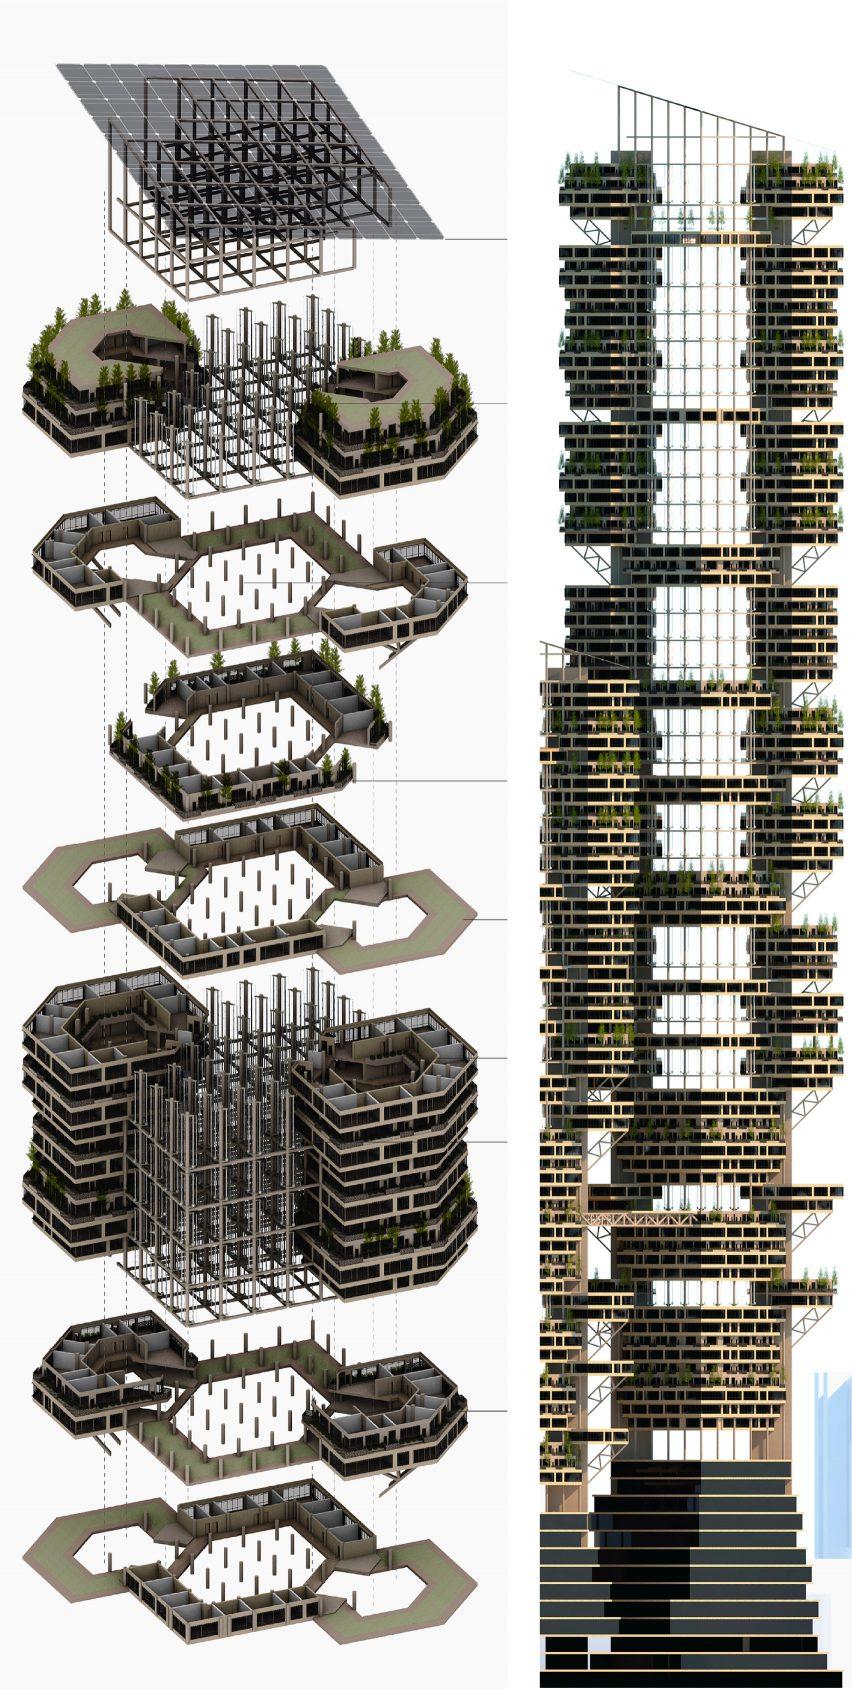 Verteco City, An Ecological Prototype for Hong Kong 2050 by Chua Rui Xiang